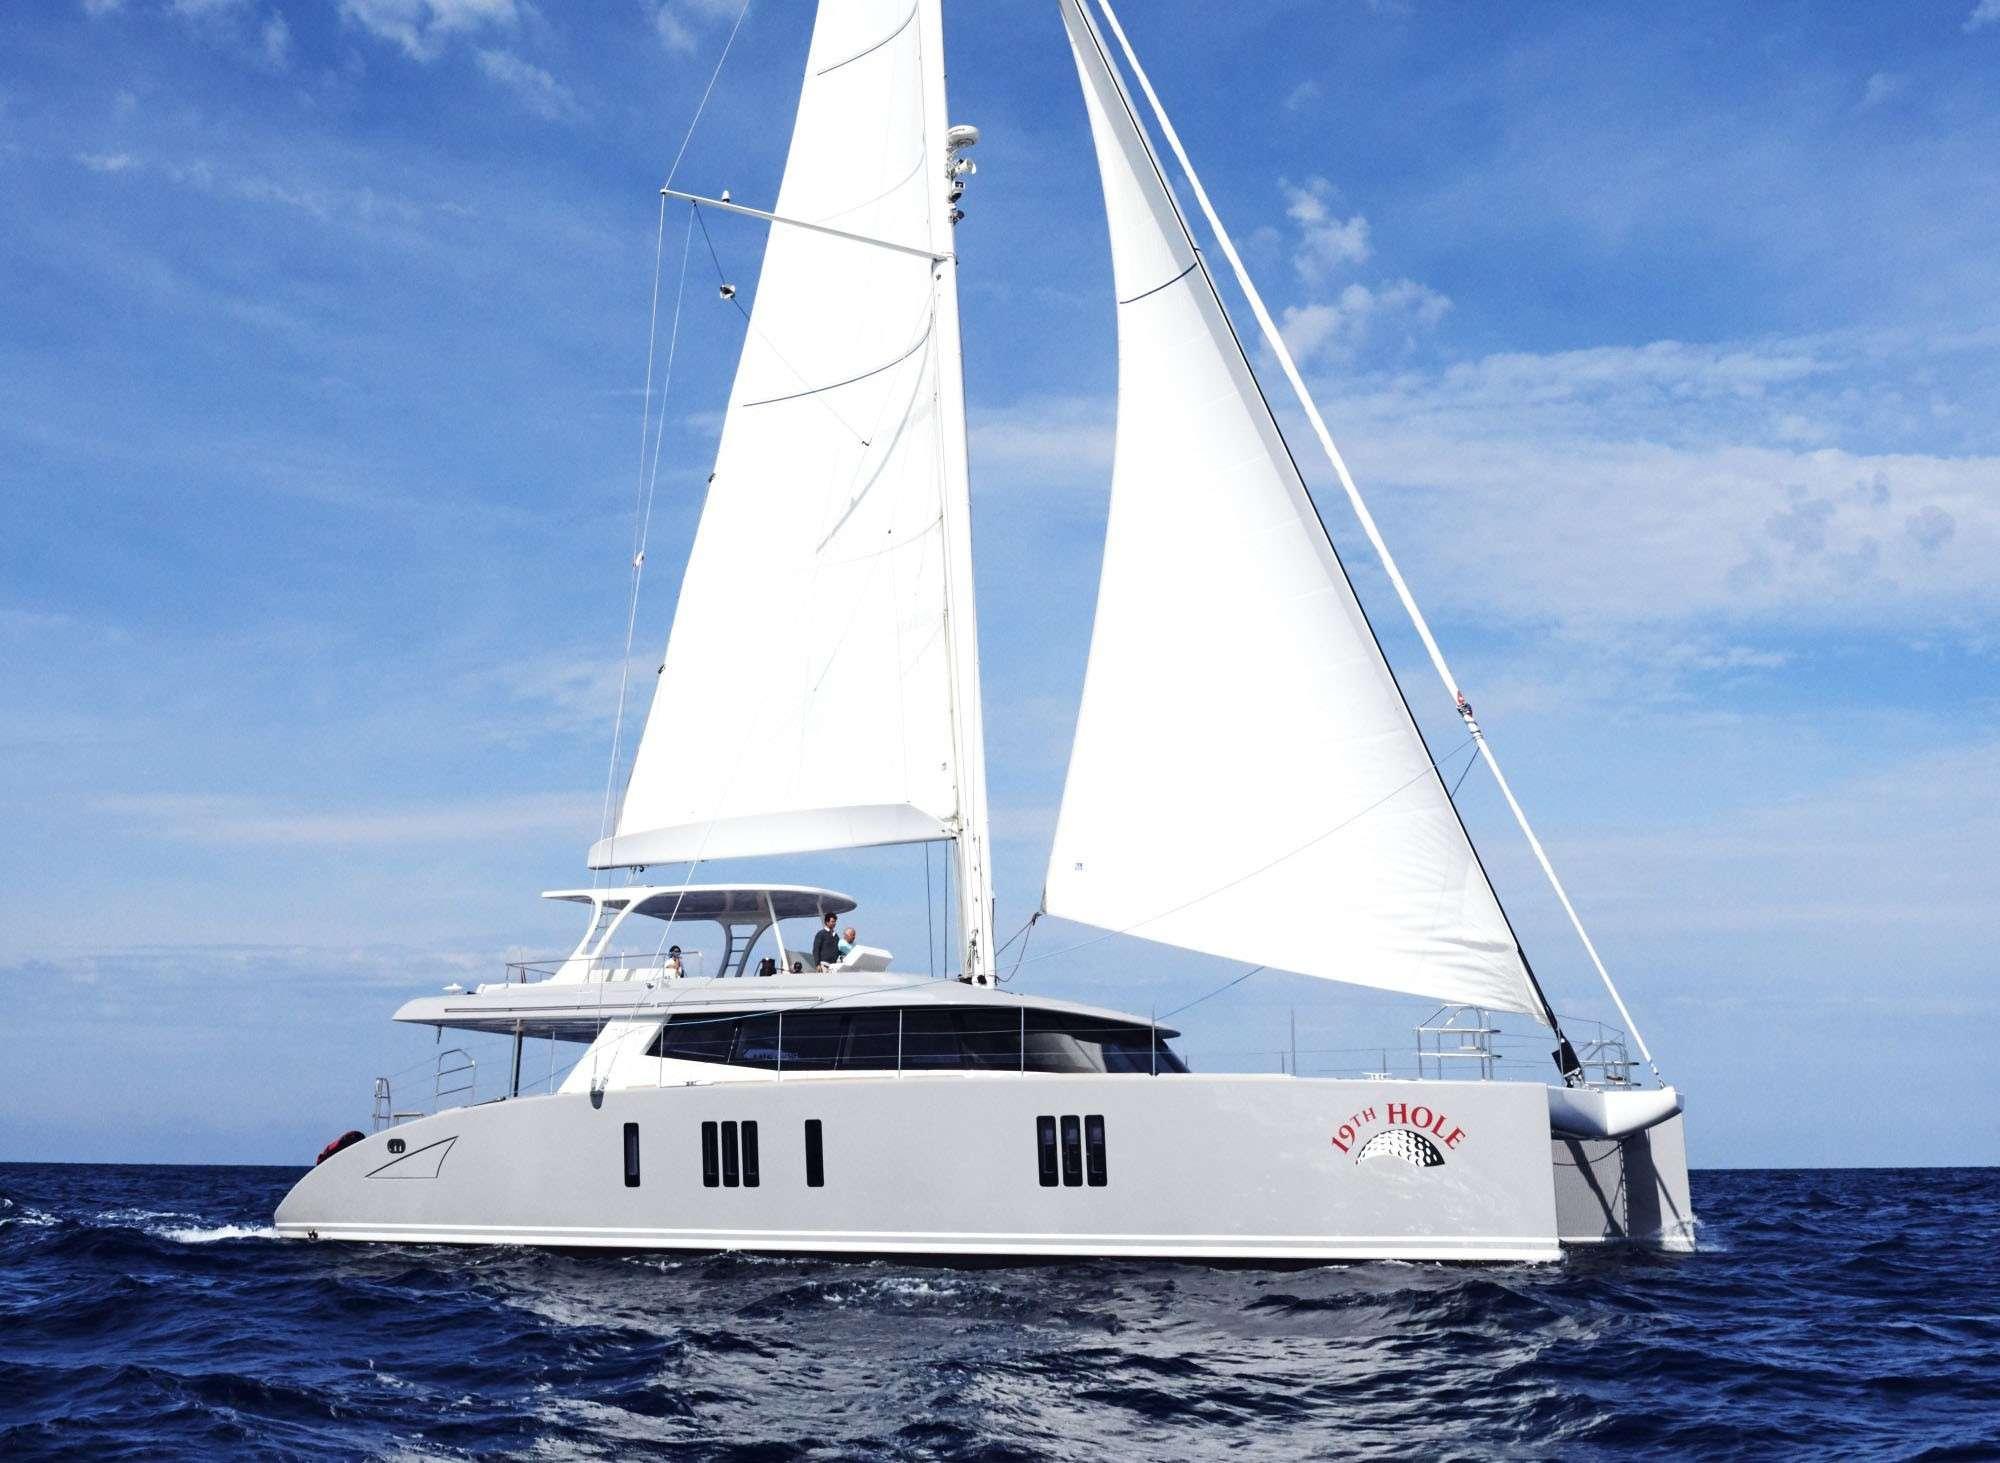 Catamaran 19TH HOLE